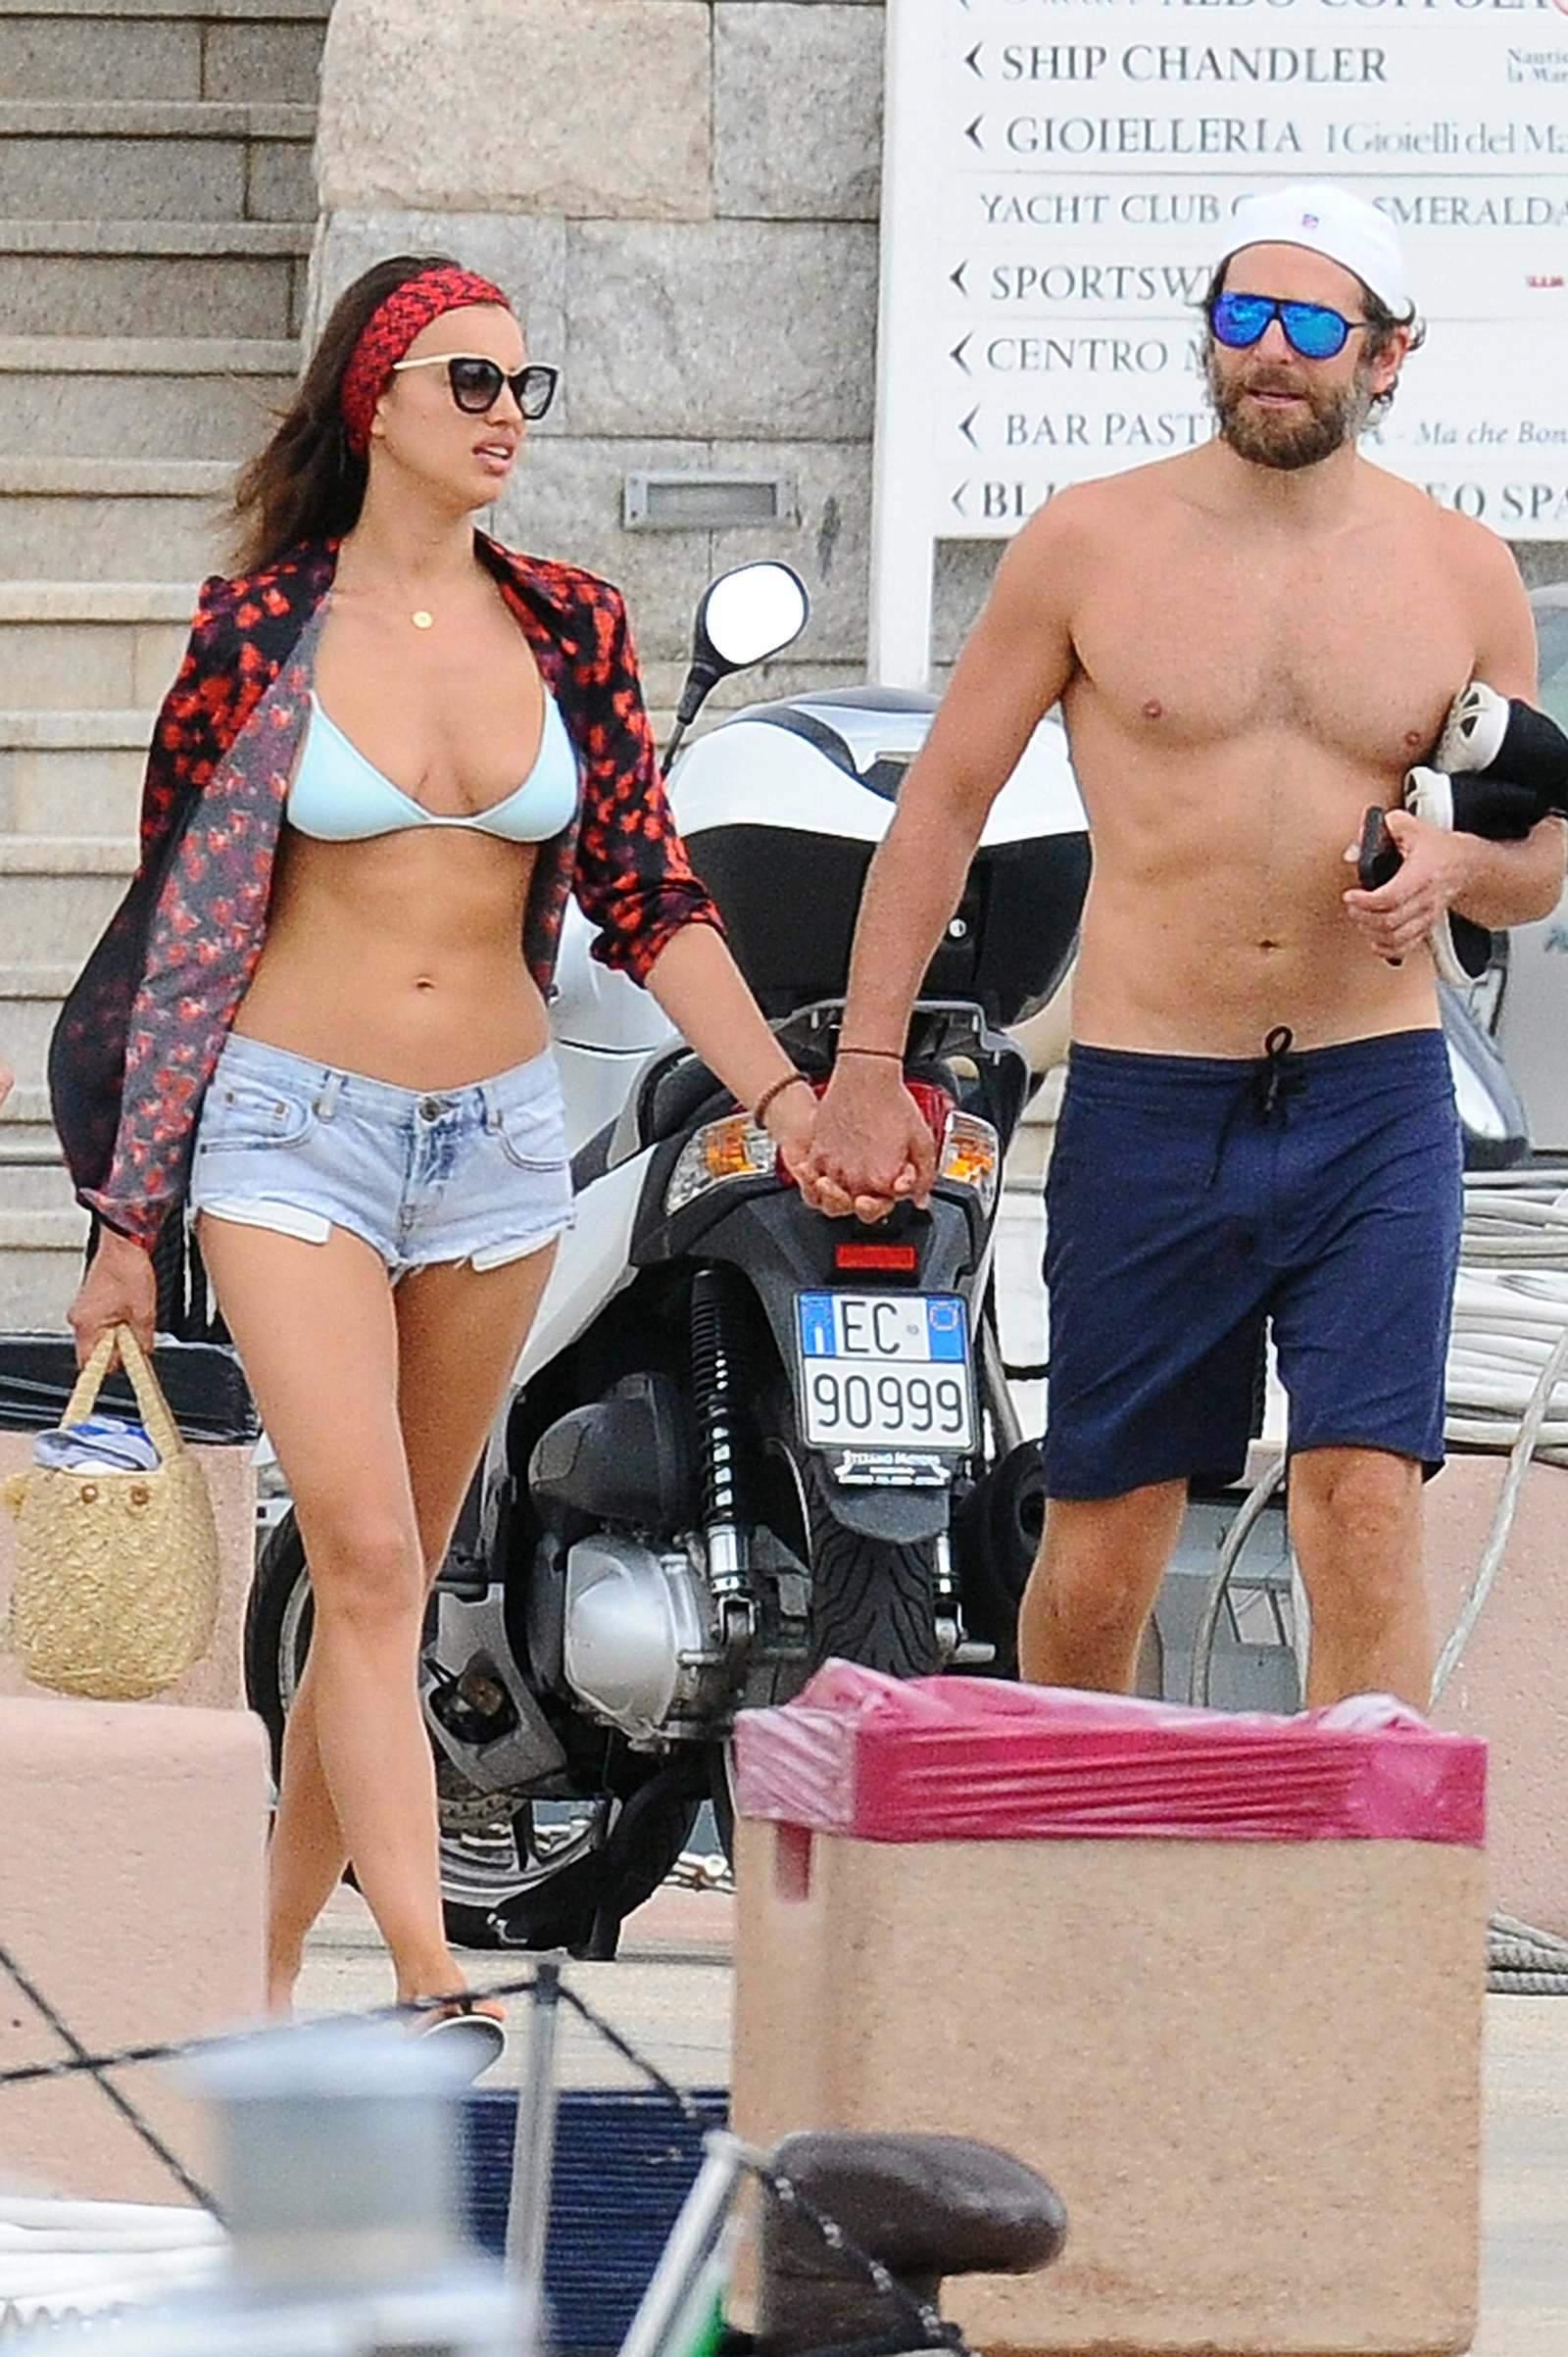 Irina Shayk in Bikini Top and Denim Shorts in Sardinia 08/01/2016